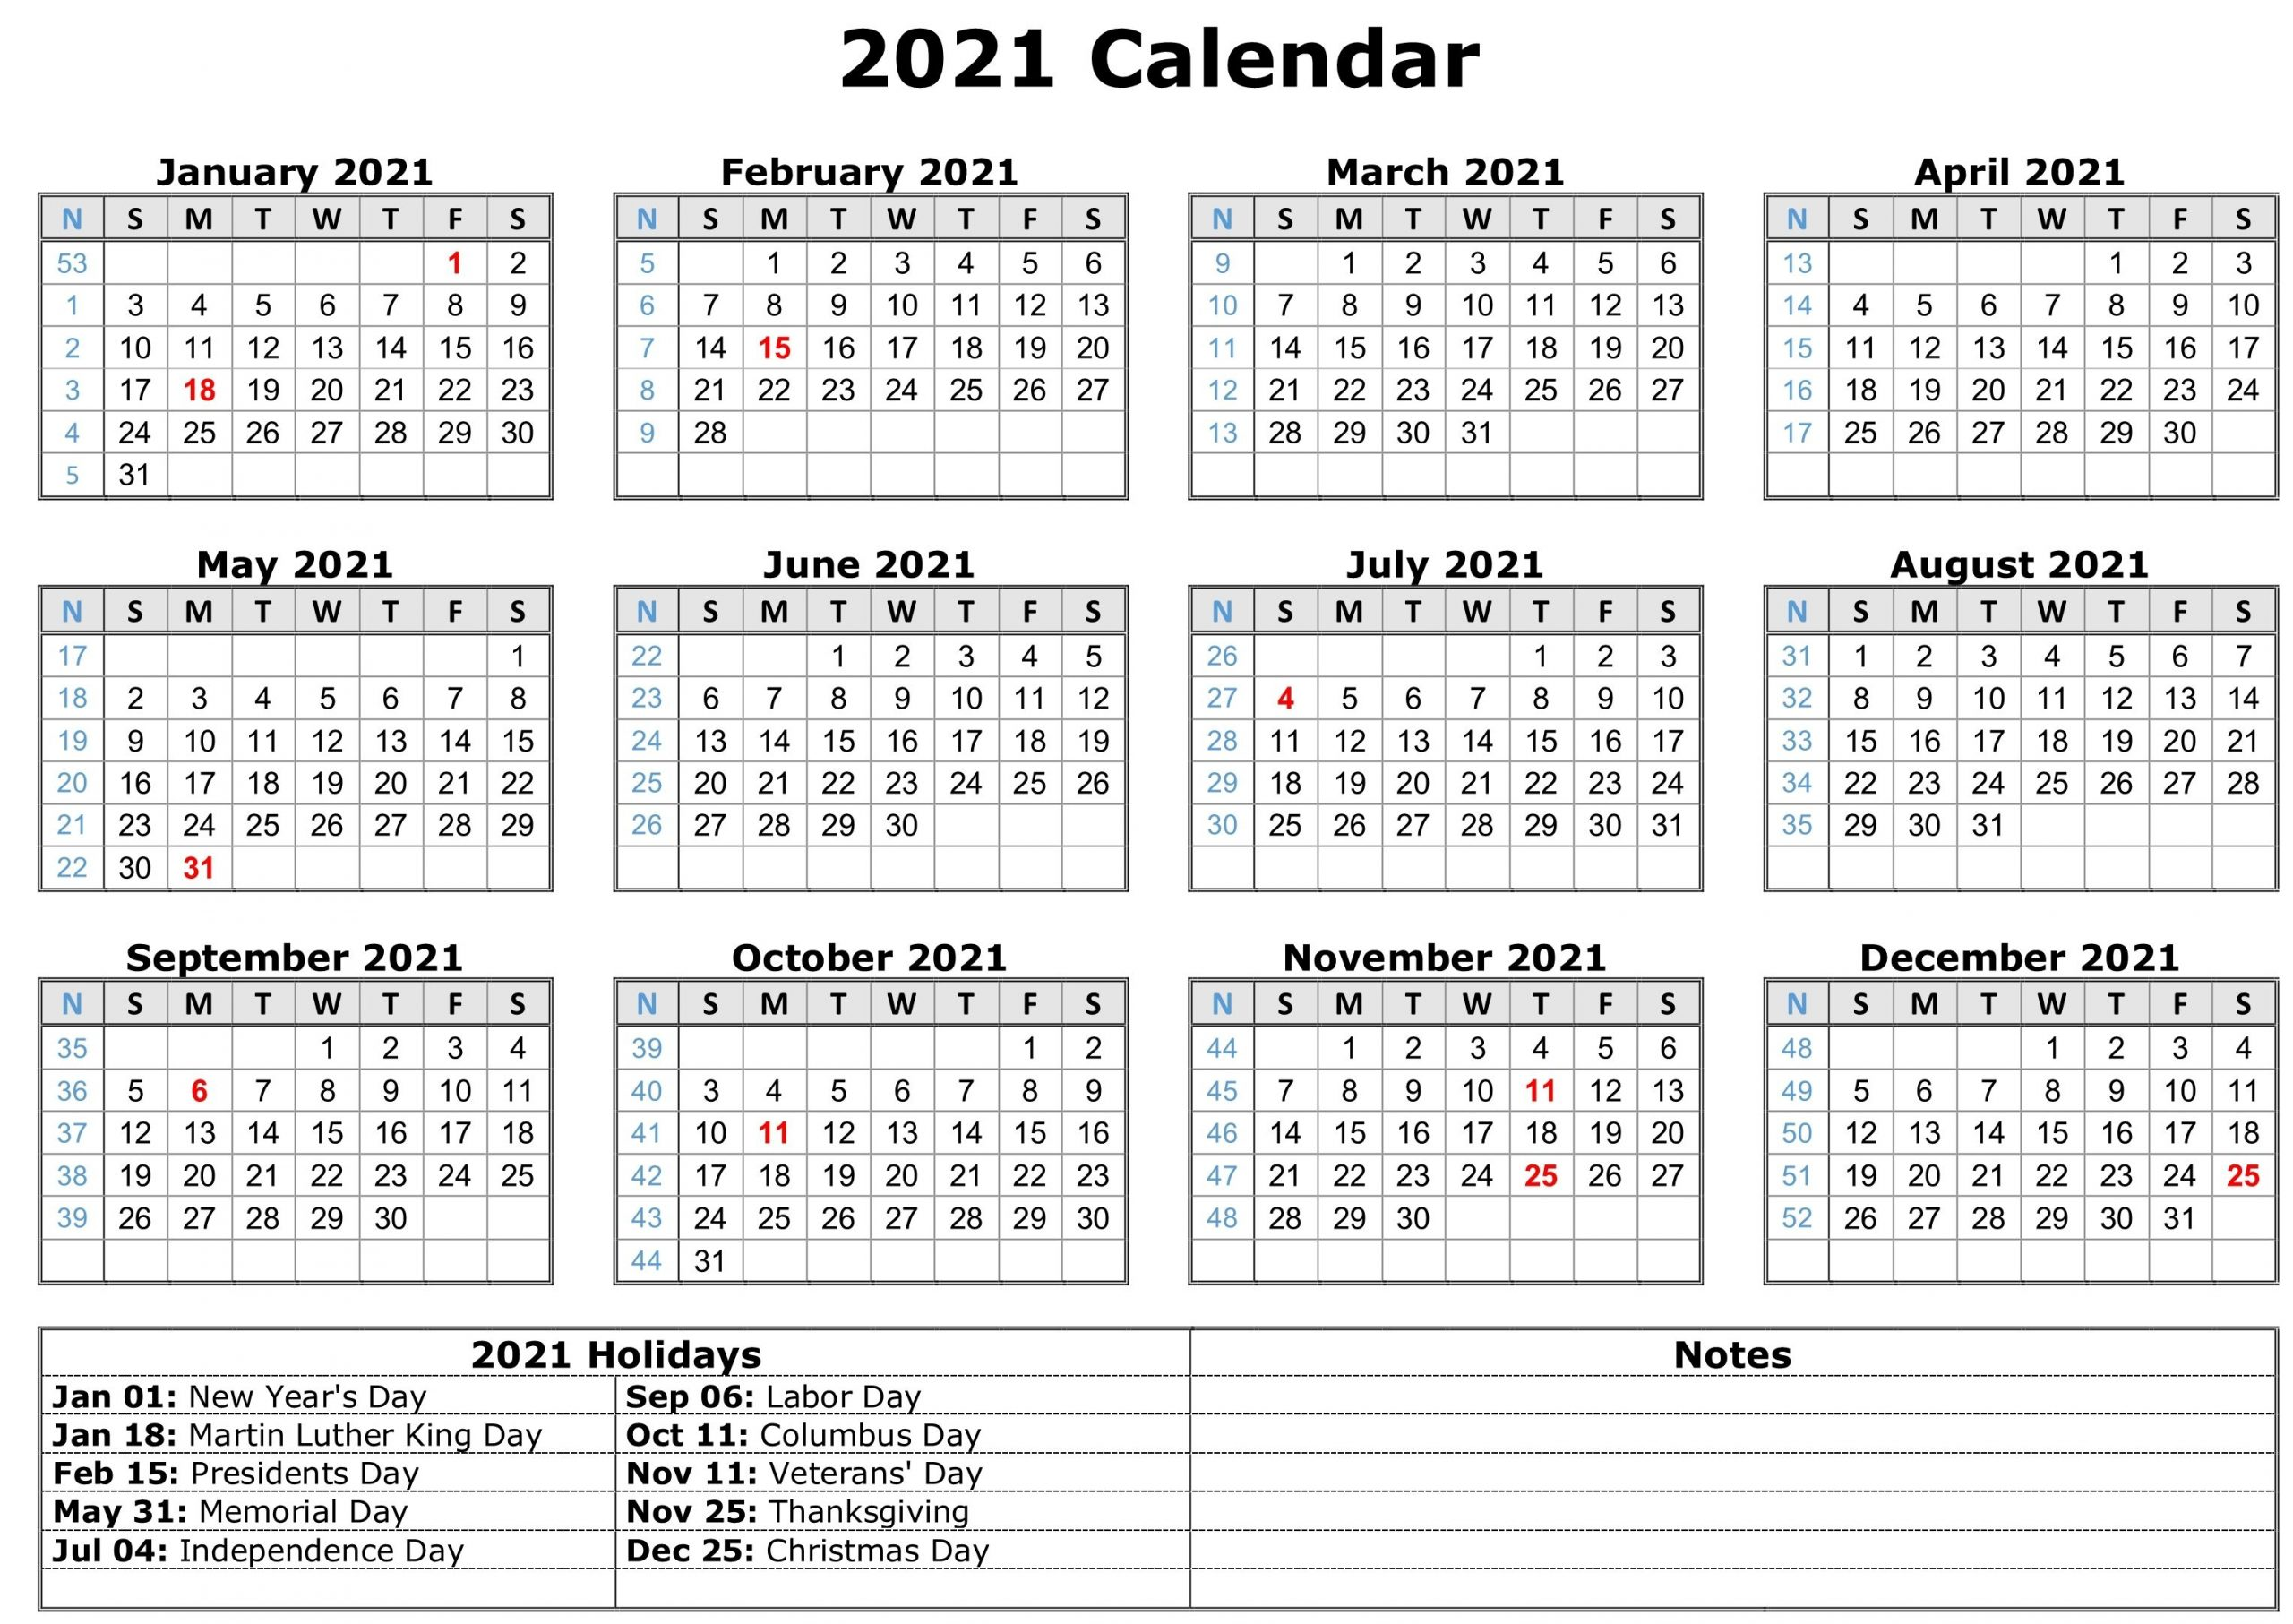 School Schedule For Springs Charter School This Week In Davidson County Tn School Candr 2021 2020